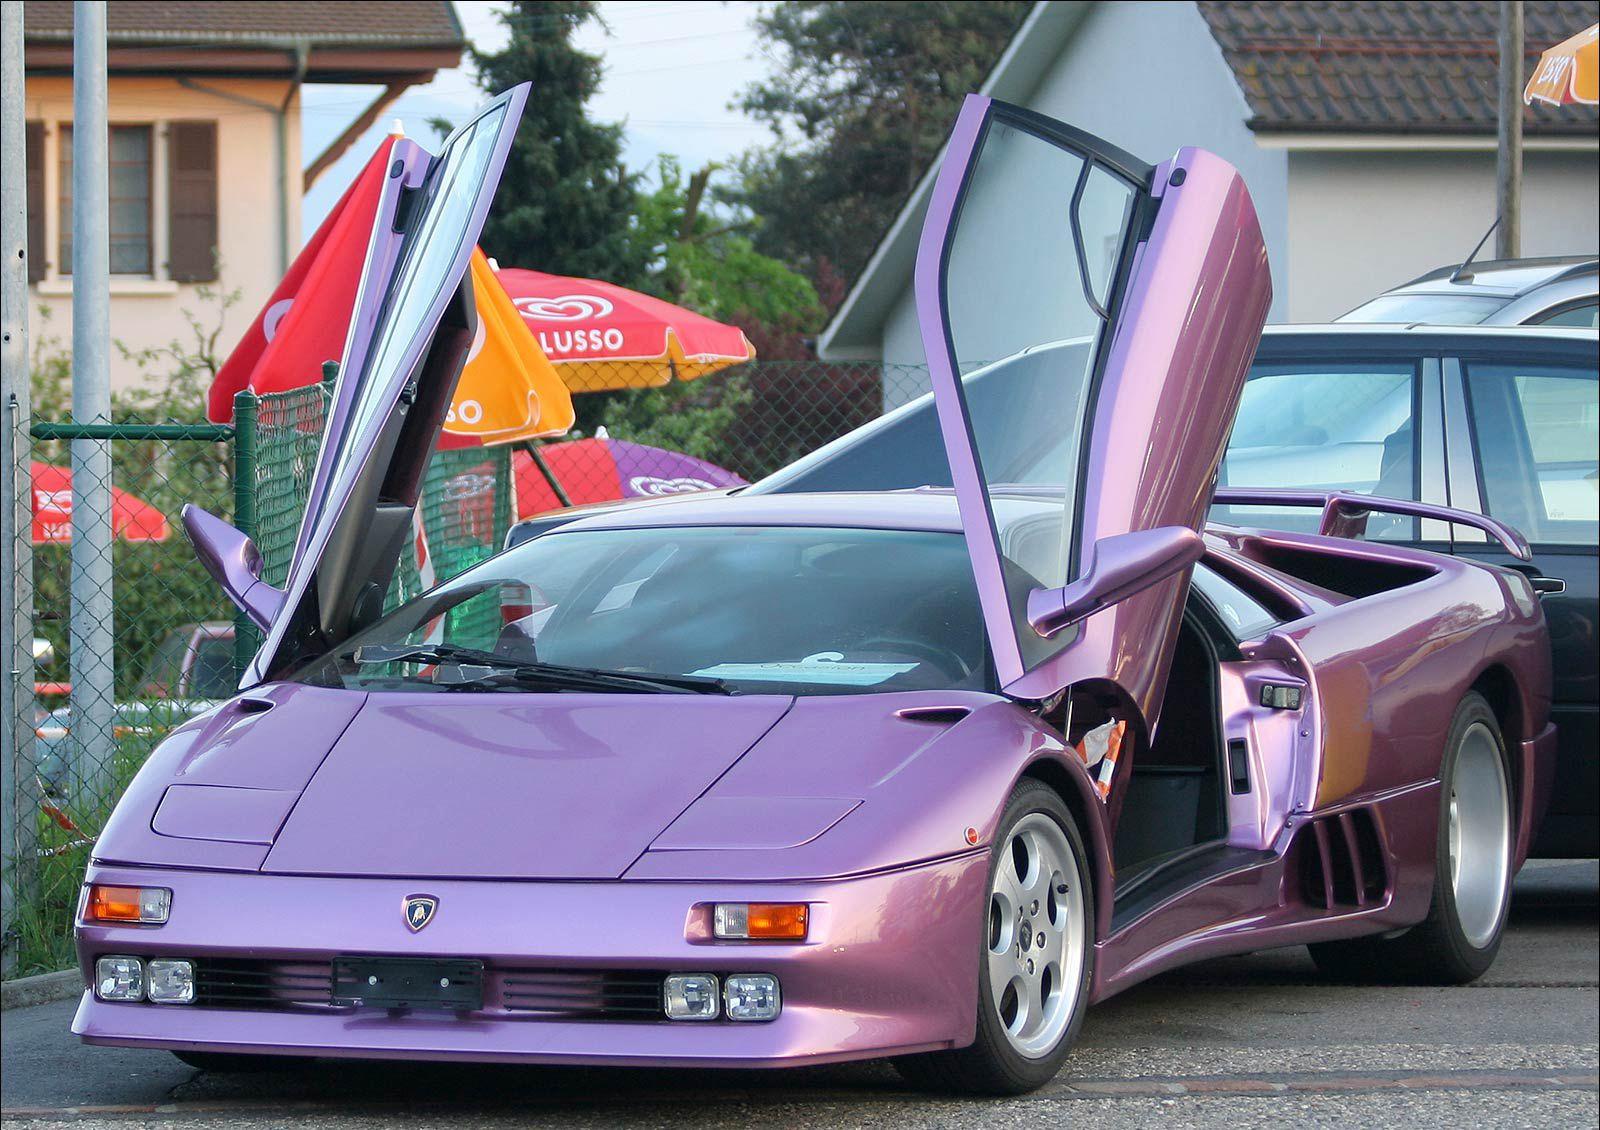 Lamborghini 30th Anniversary Lavender Metallic  Purple  Colors